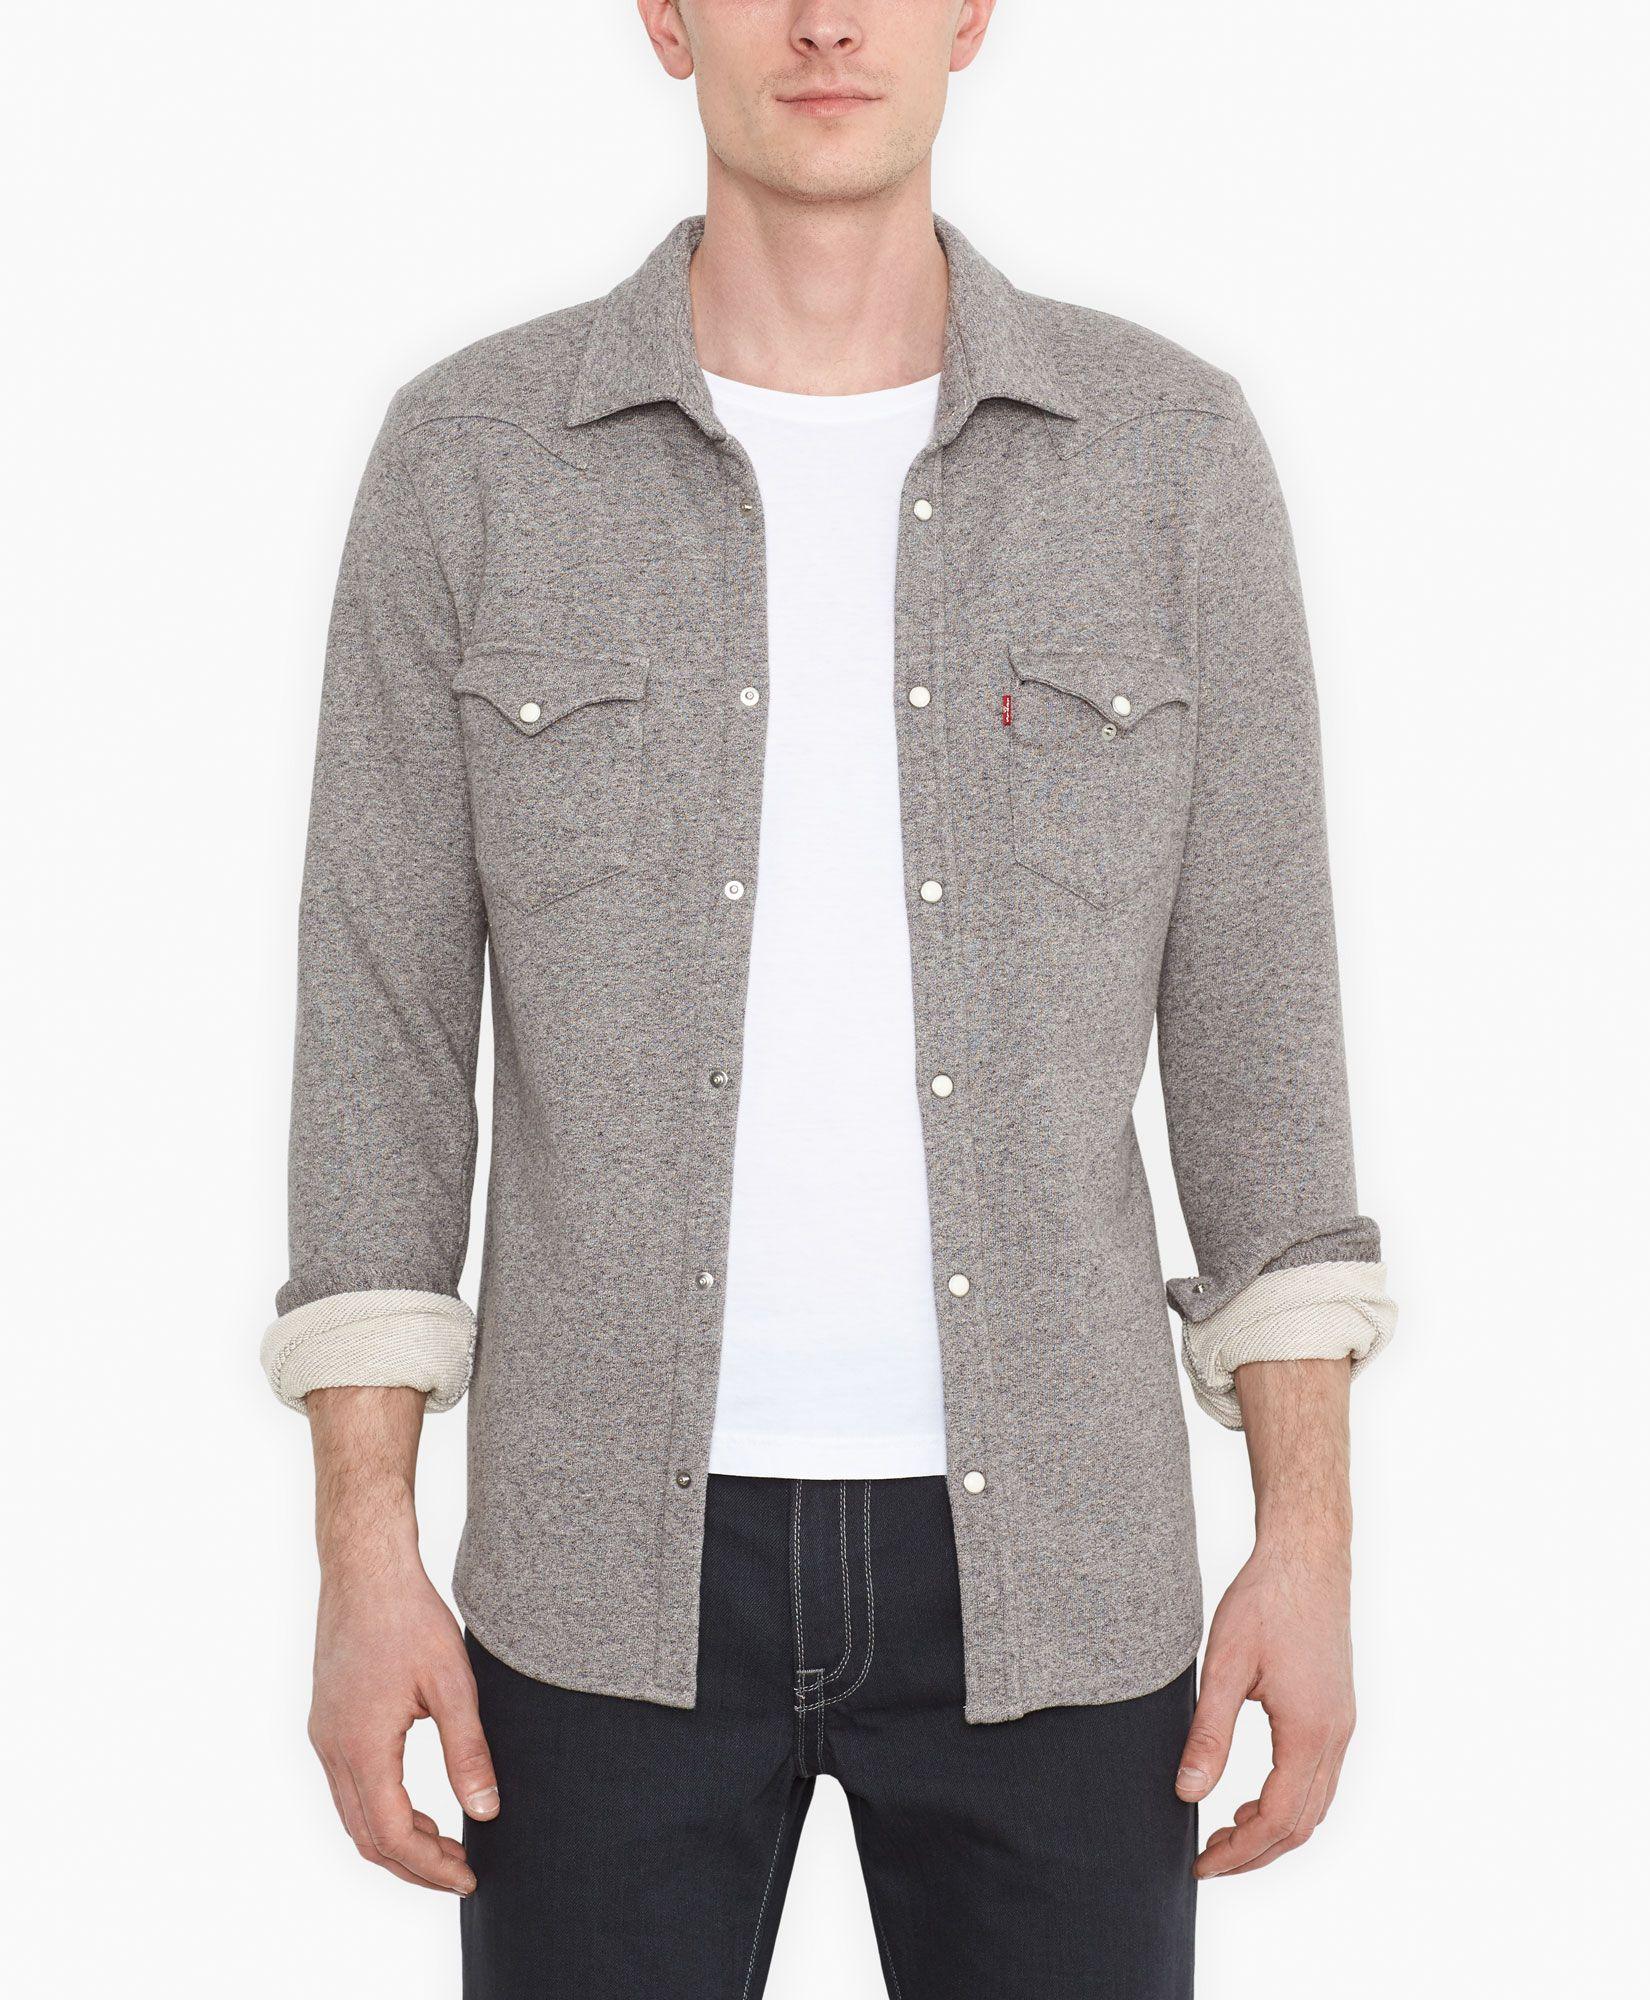 473a2dff666 Levi s Barstow Western Fleece Shirt - Medium Grey Heather - Shirt Shop